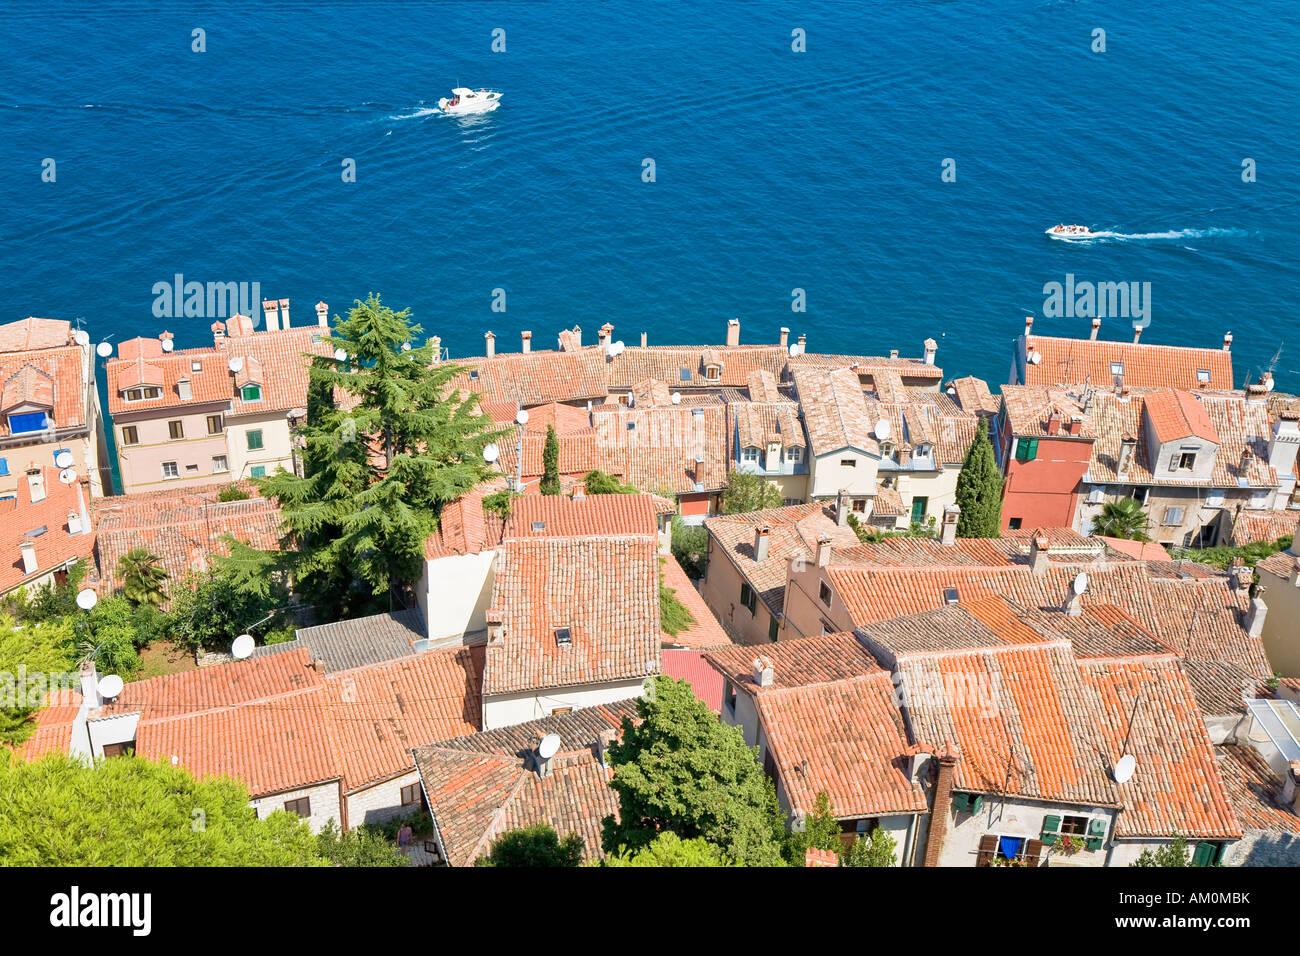 Look about a part of Rovinj, Istria, Croatia Stock Photo